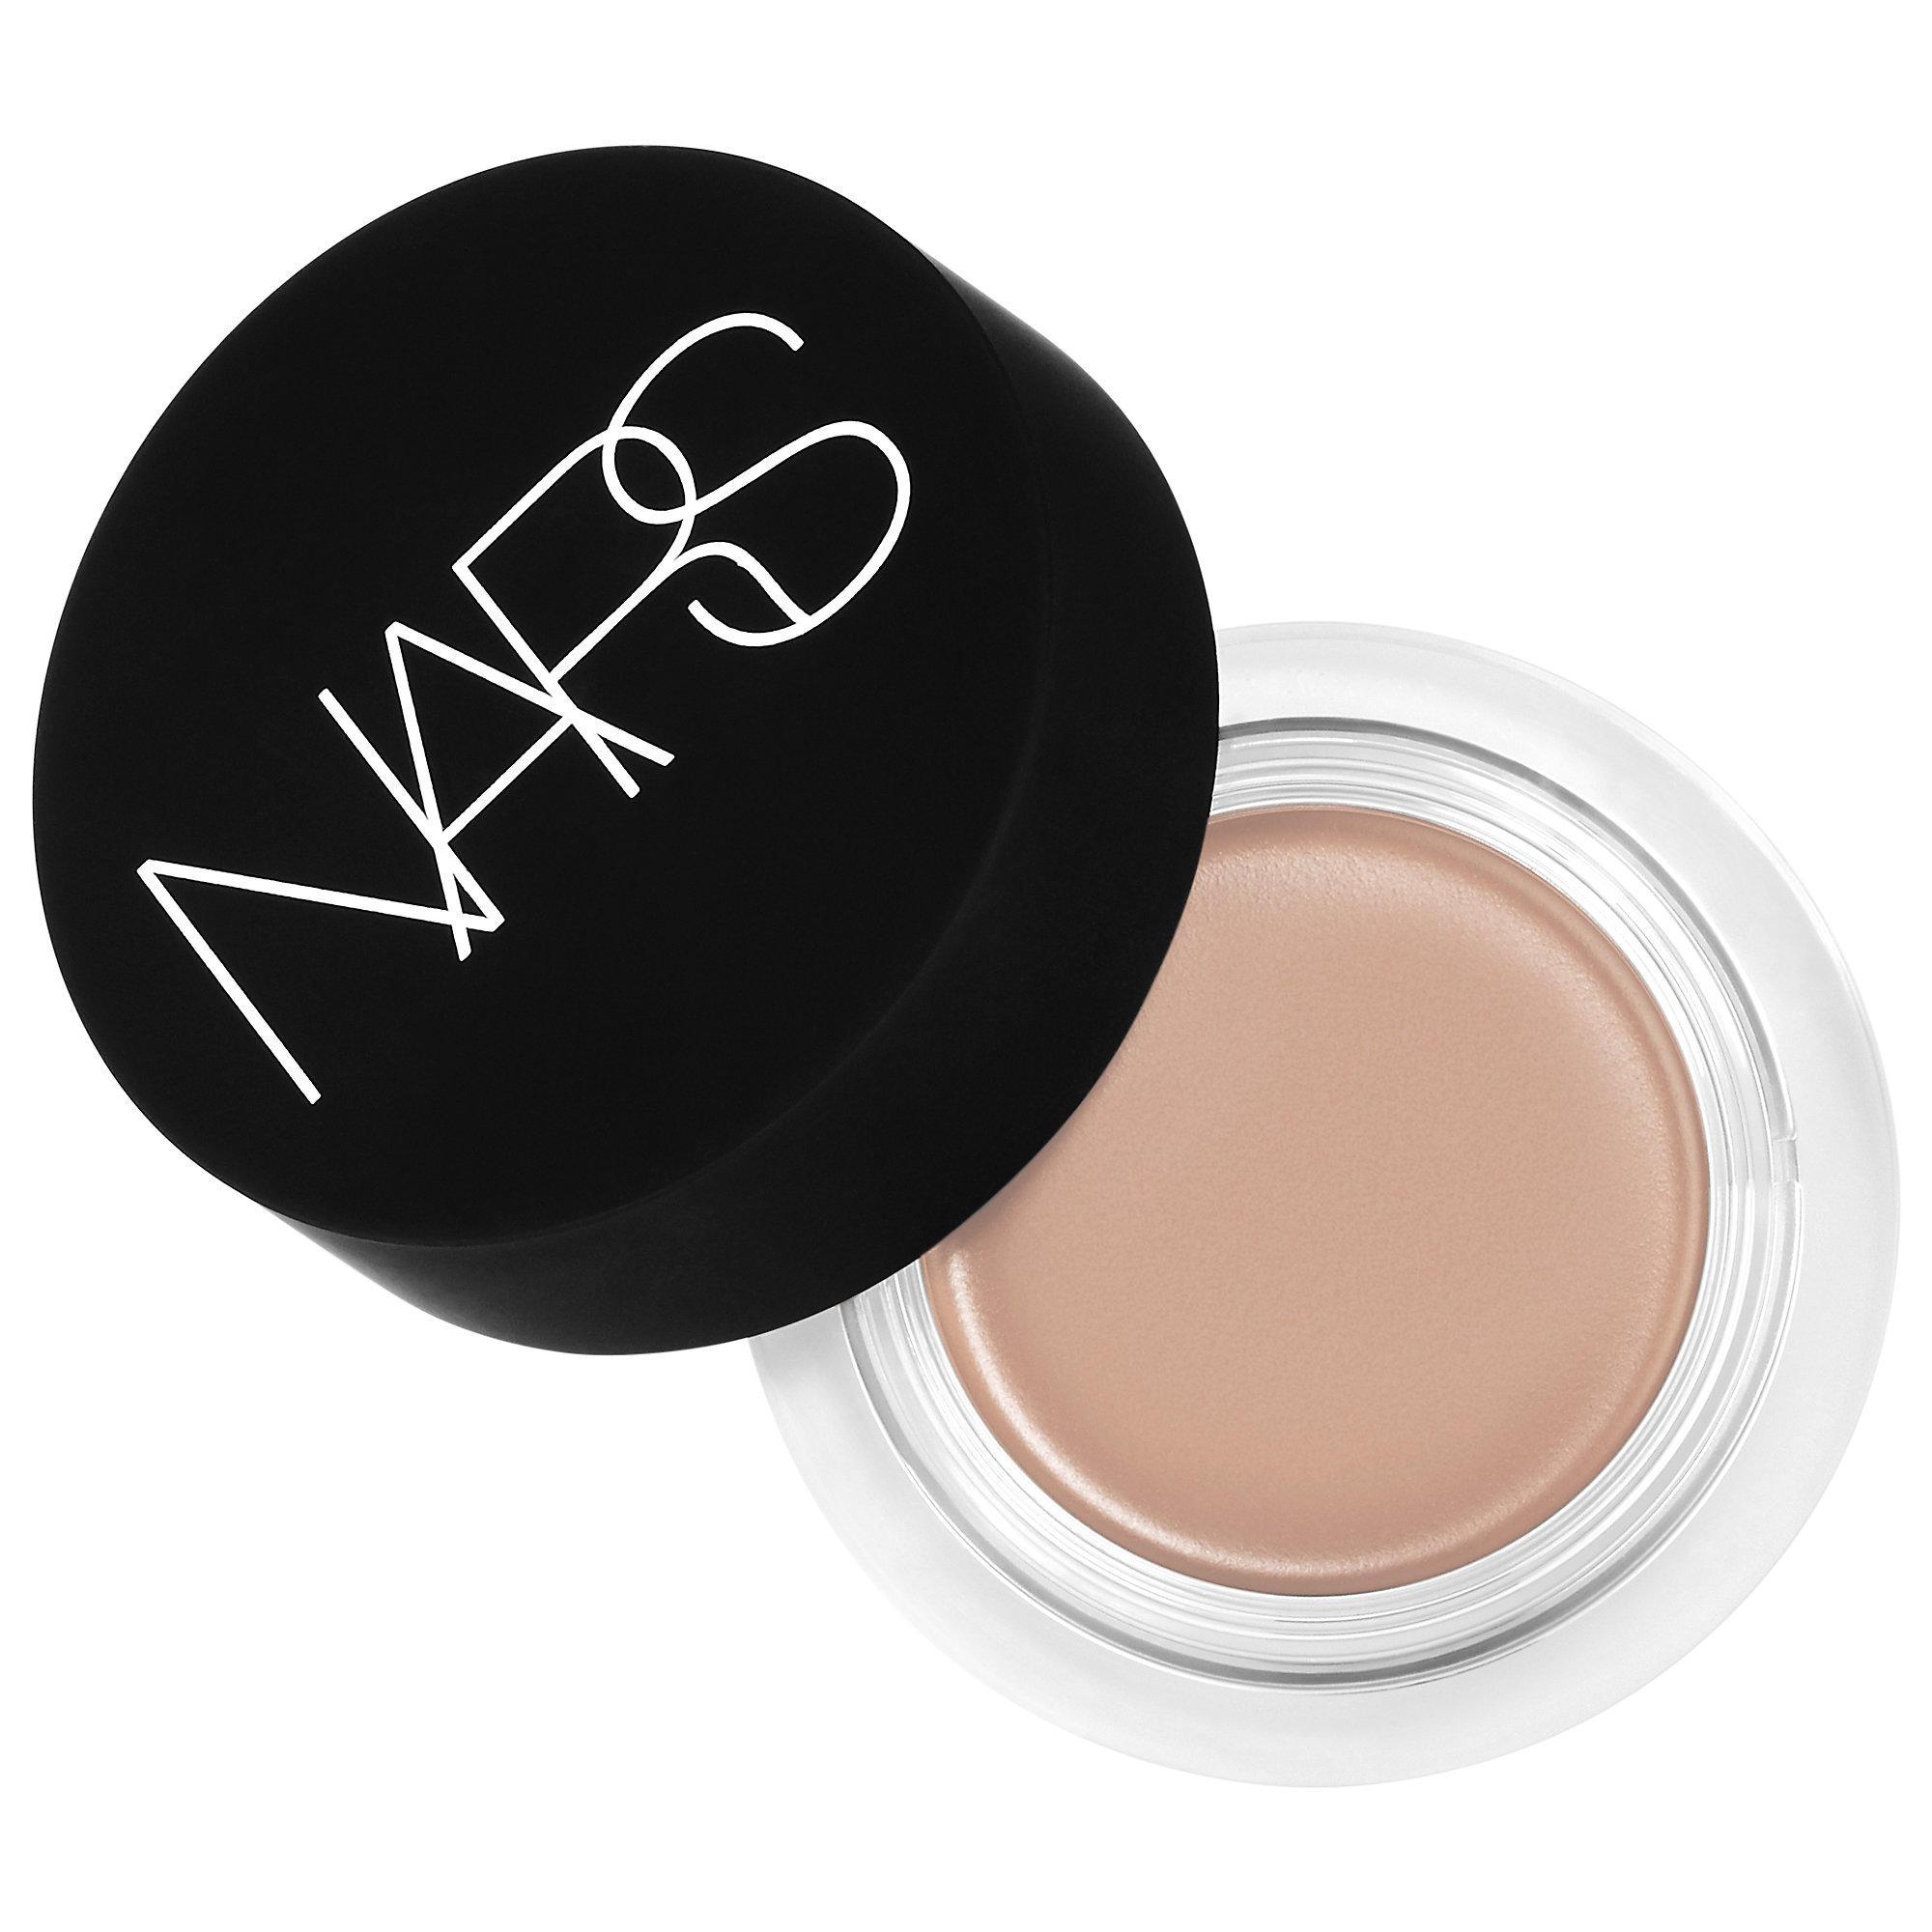 NARS Soft Matte Complete Concealer Macadamia Medium 1.5